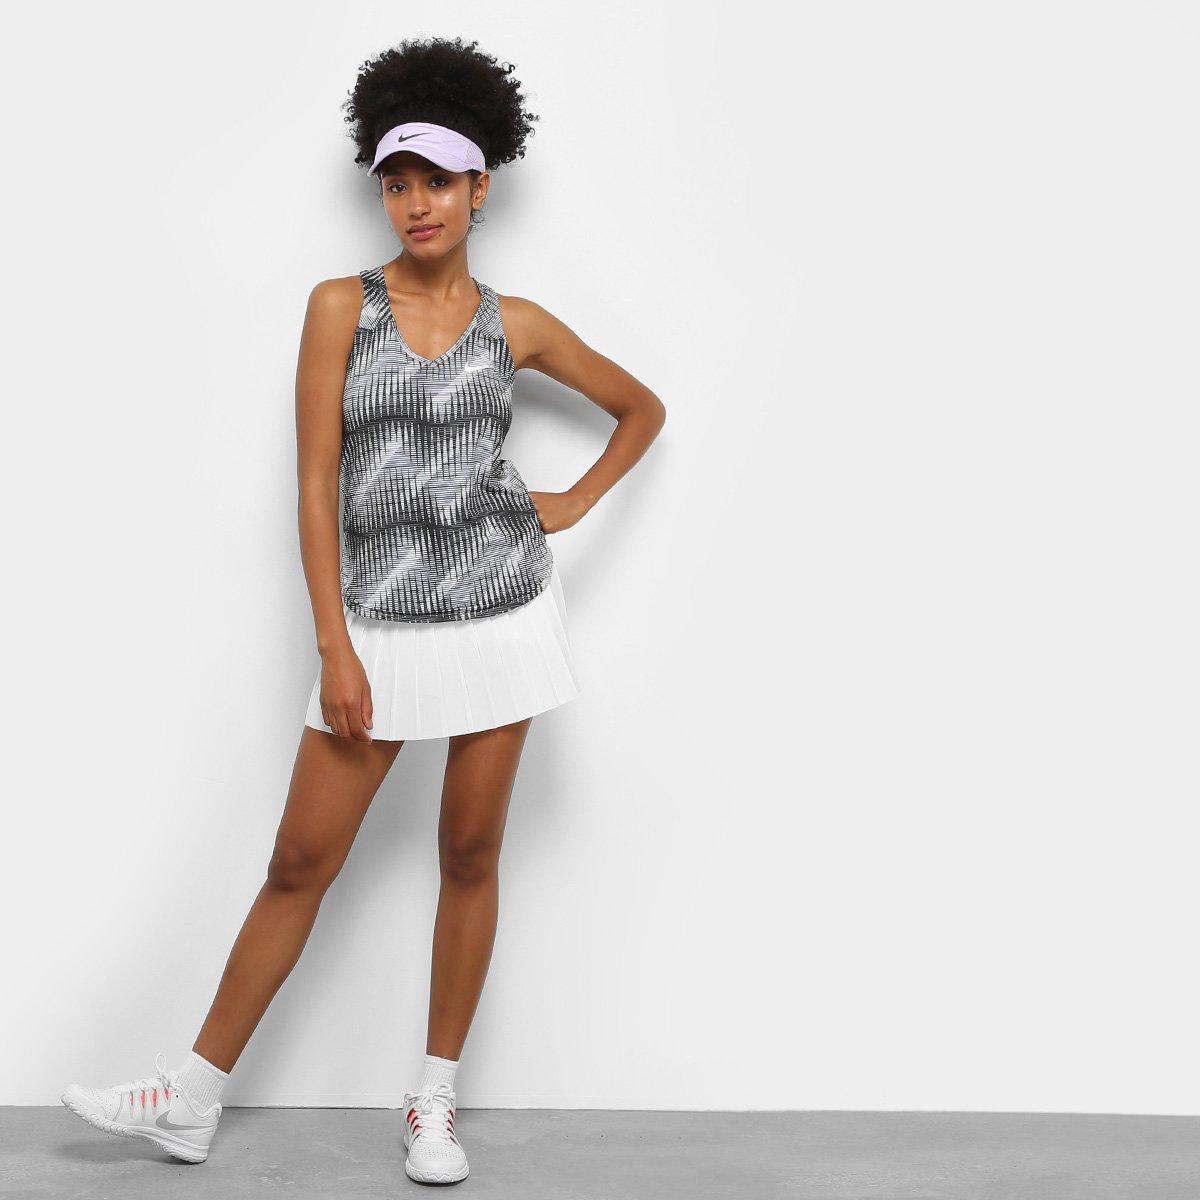 Preto Pure Branco Nike Feminina Regata PR Nike Regata e qw7U8gEt